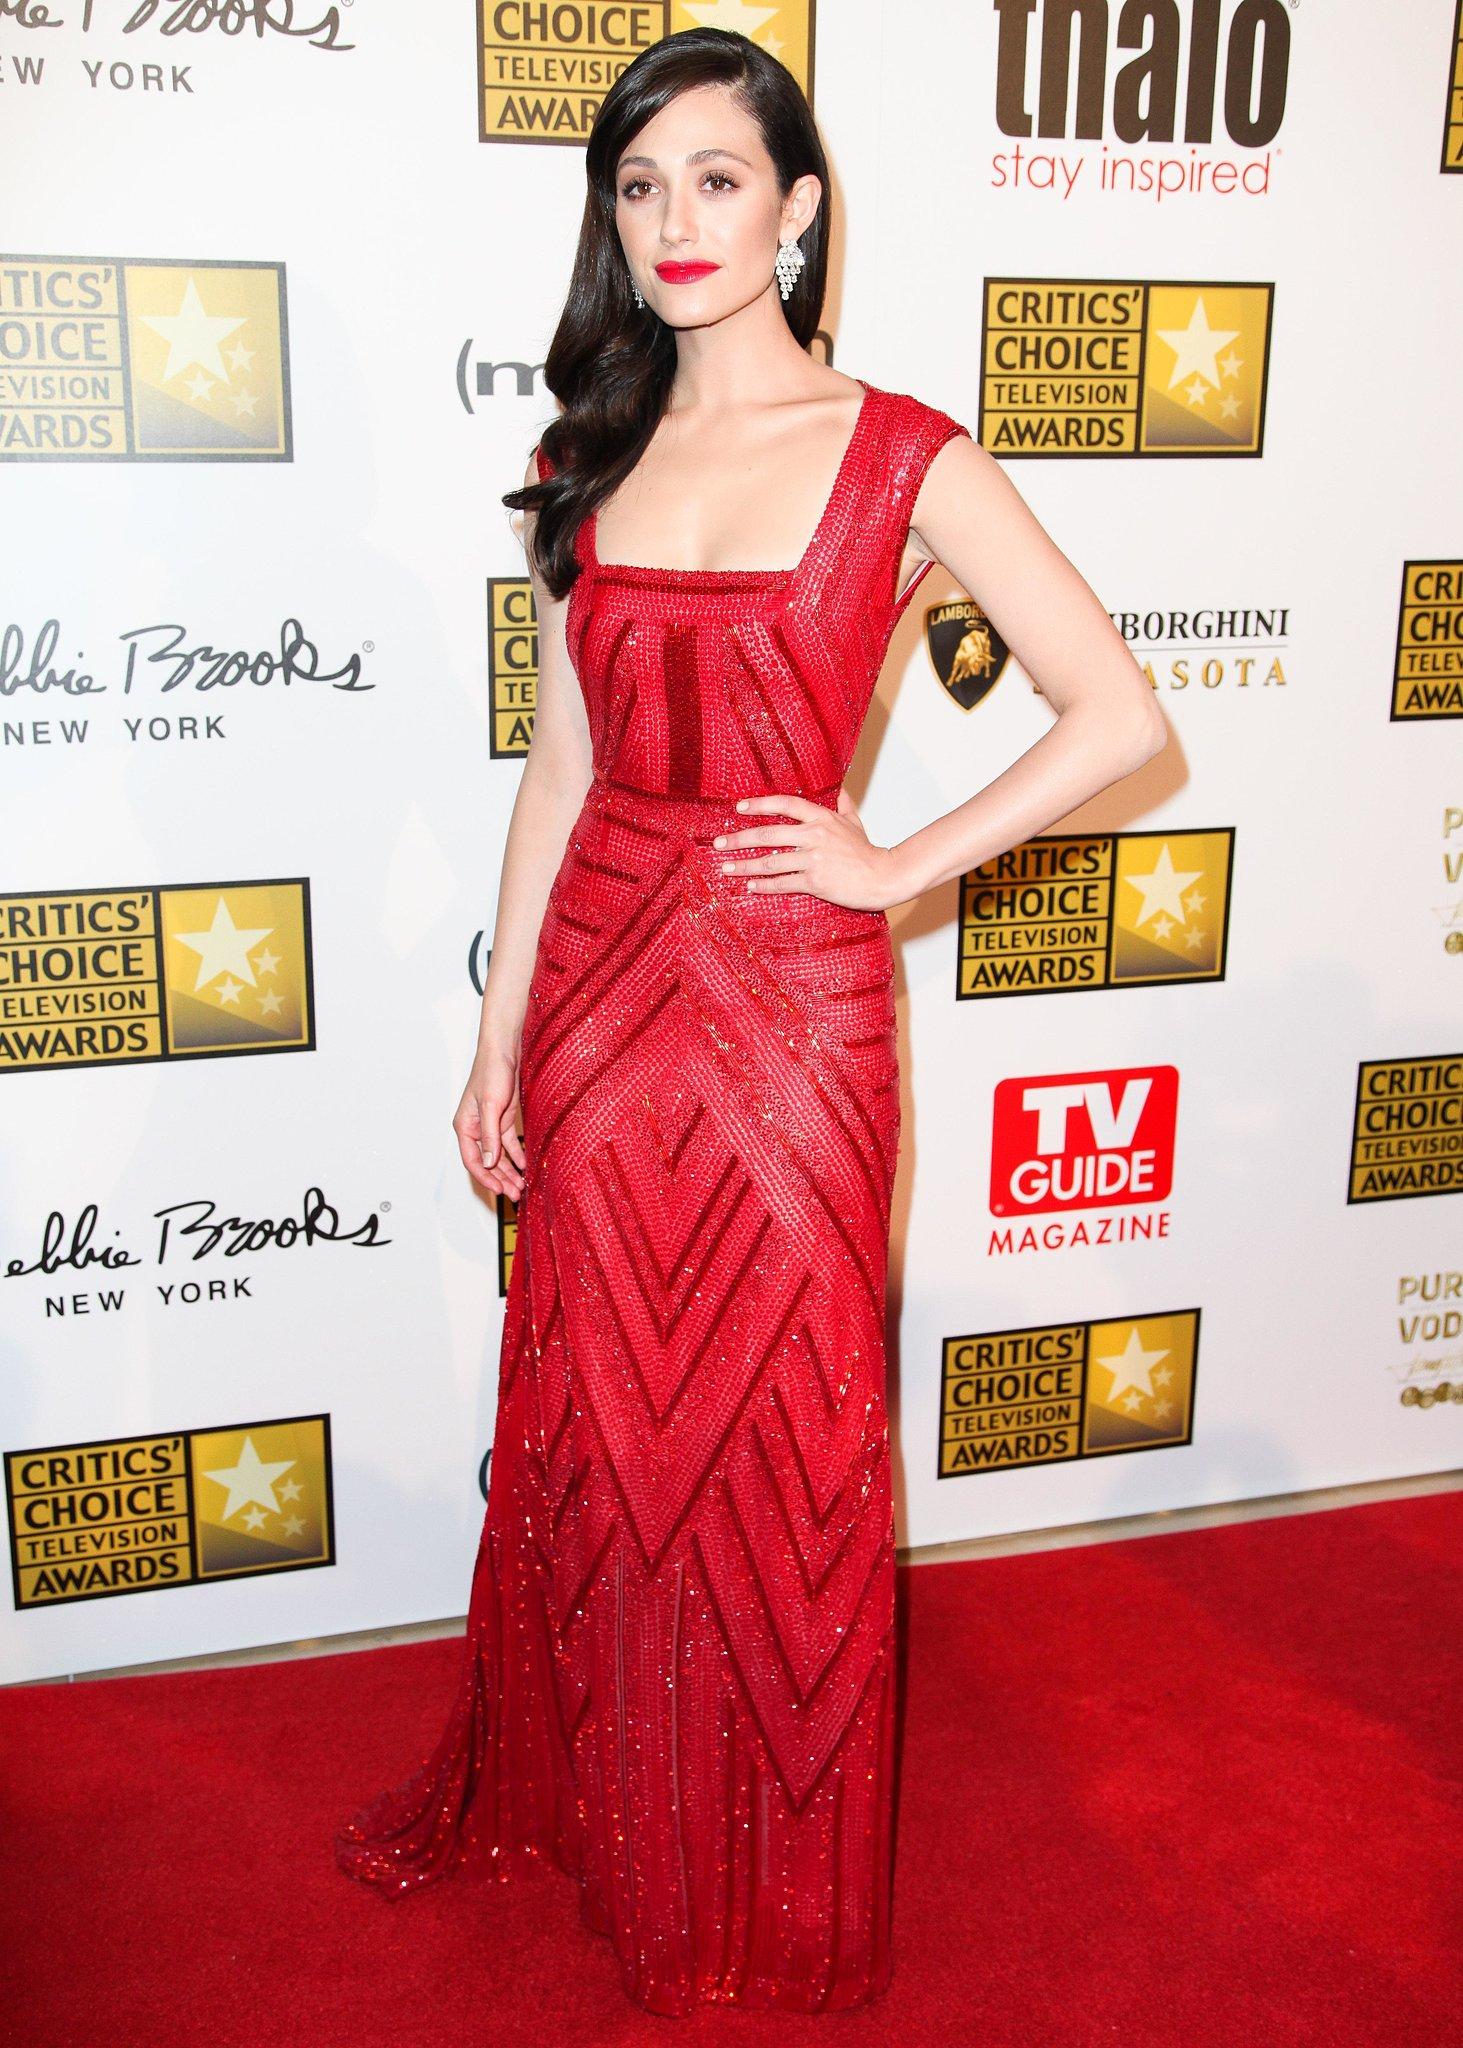 Emmy Rossum at the 2013 Critics' Choice Television Awards in Los Angeles.  Source: Aleks Kocev/BFAnyc.com